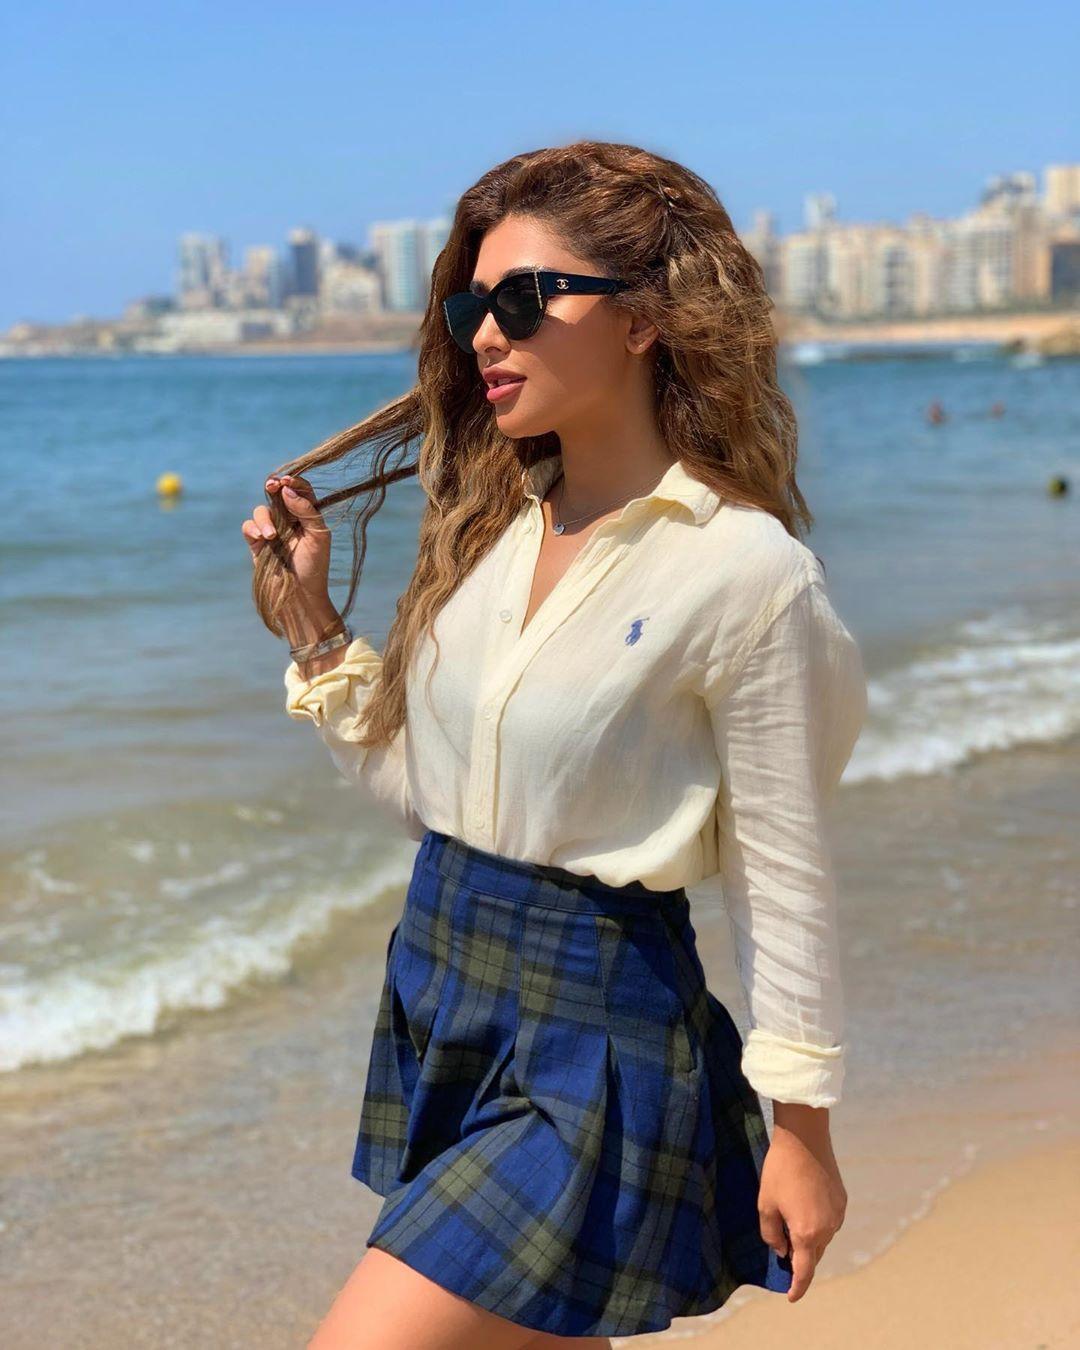 Eleen Suliman الين سليمان On Instagram اشتقت للصيف High Waisted Skirt High Waisted Waist Skirt